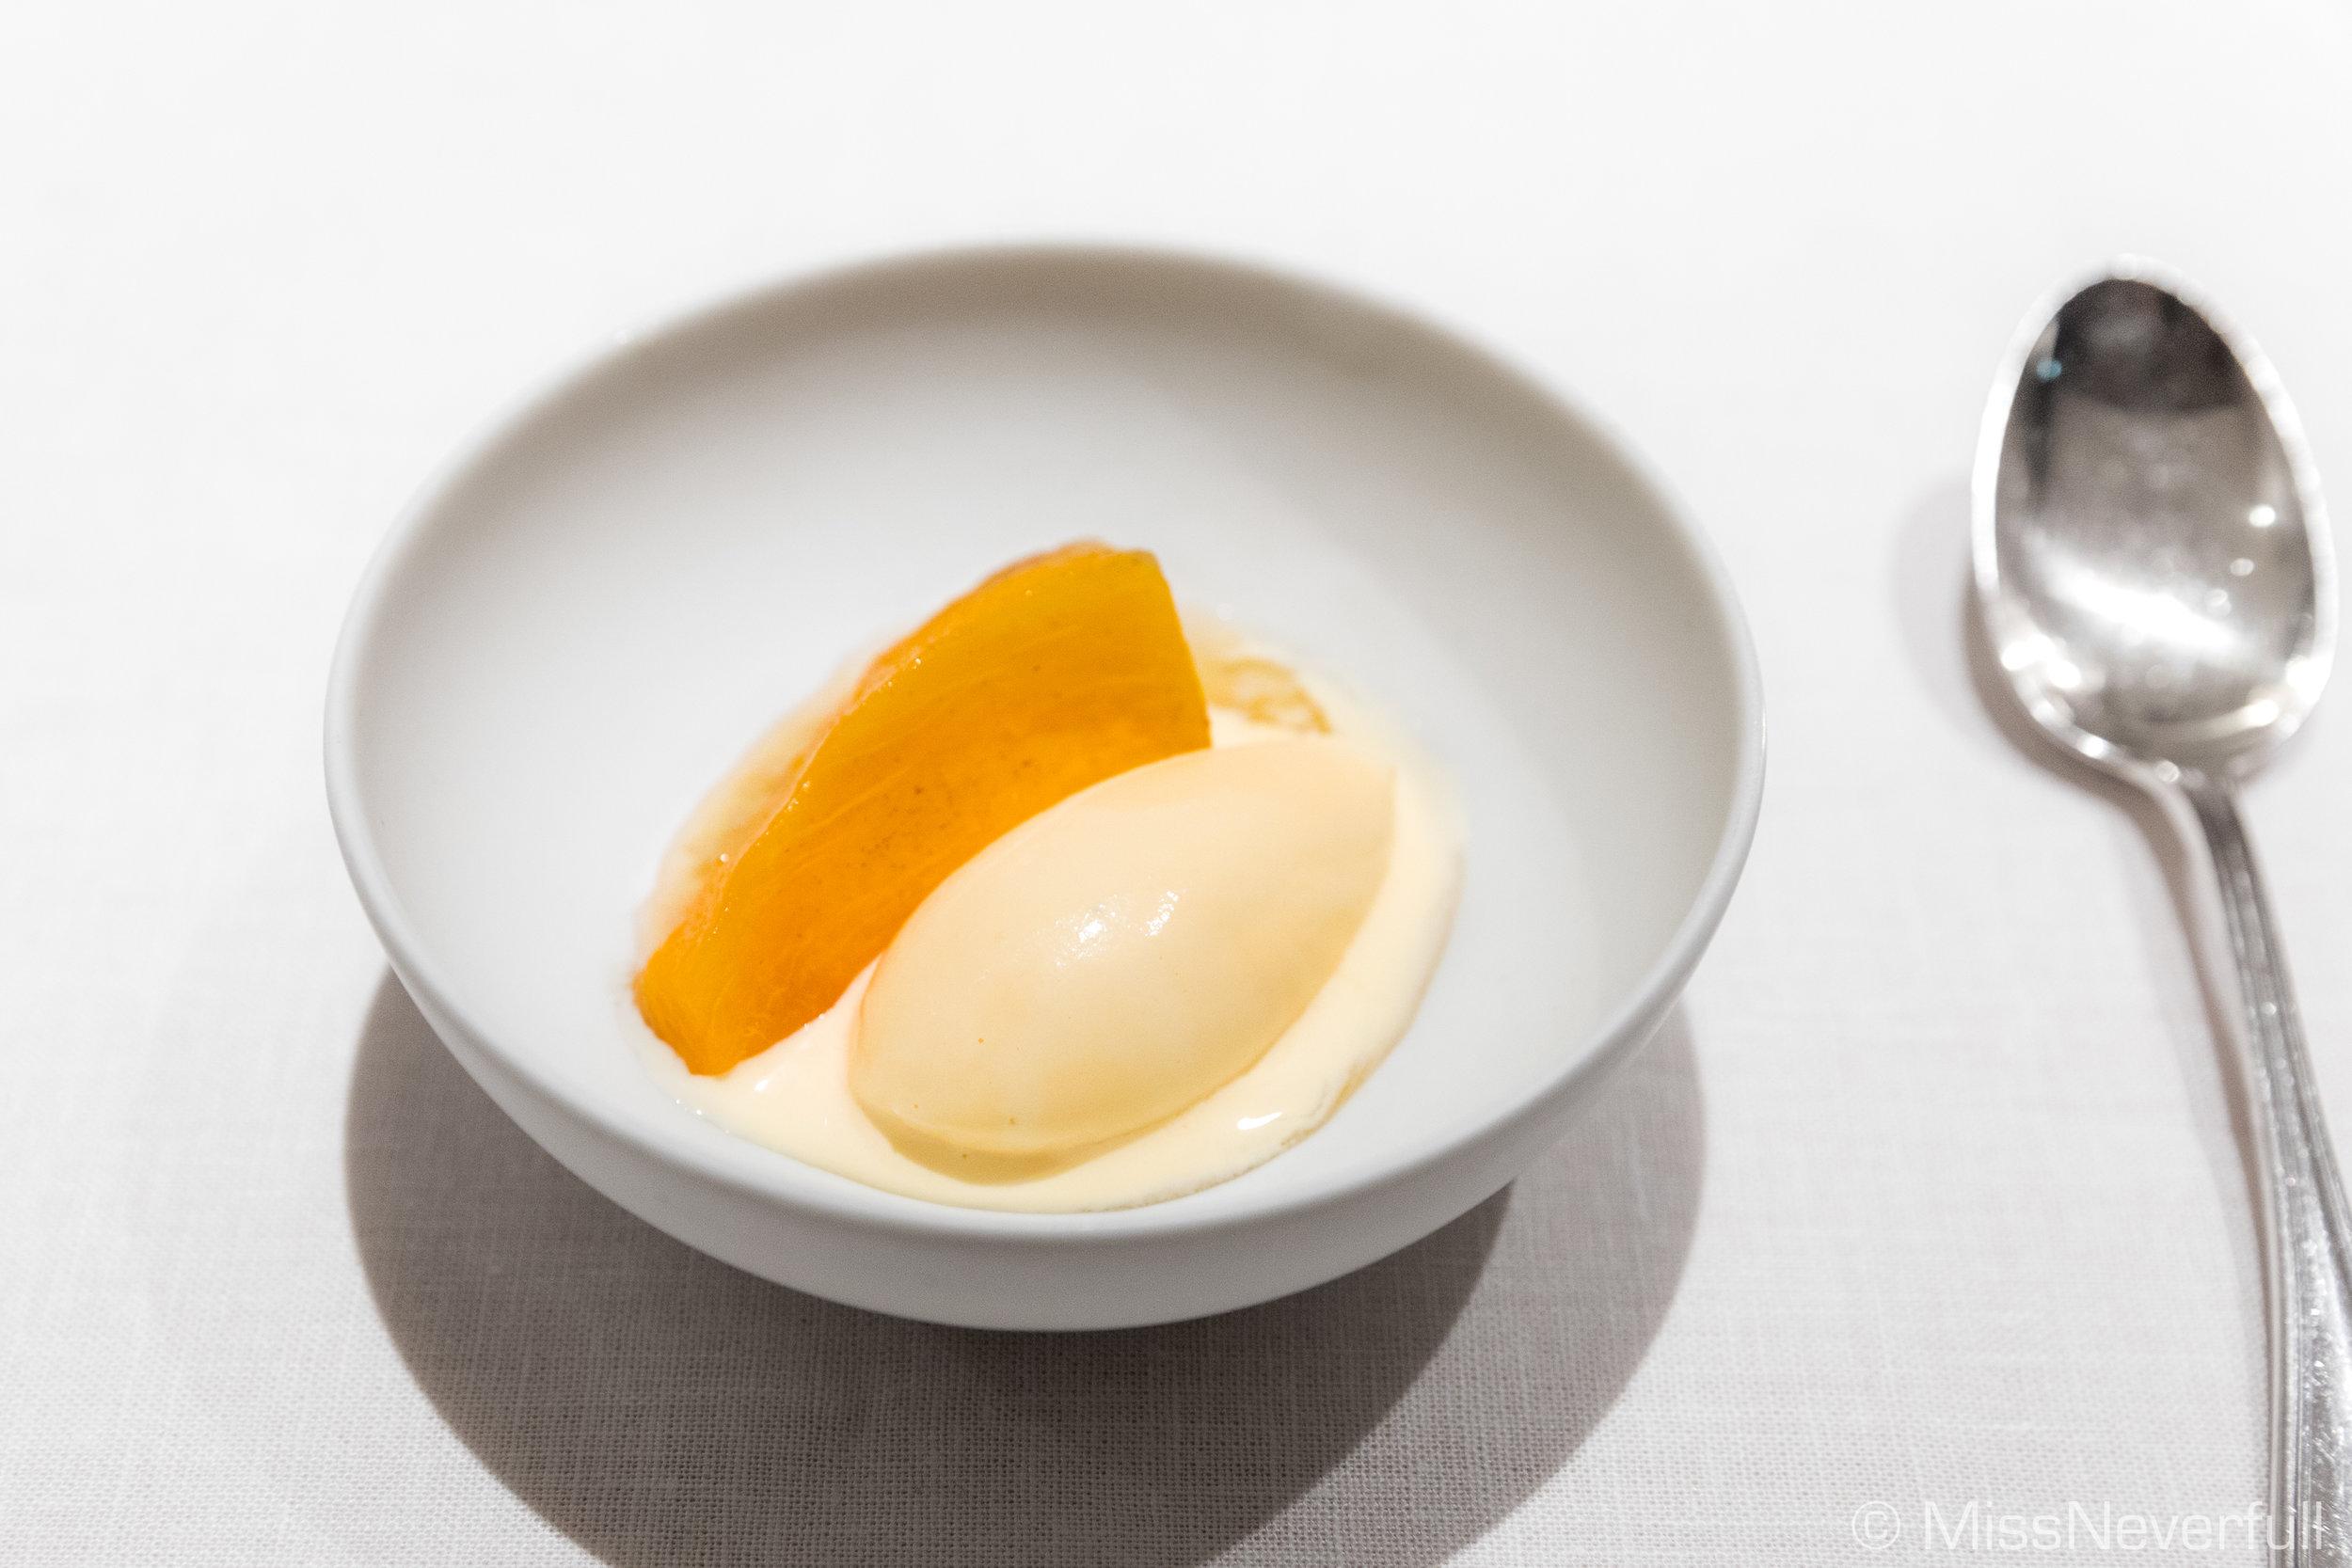 8. Dessert: Grilled Persimmon with Shaoxing Wine Ice Cream (焼き柿と紹興酒のアイスクリーム)